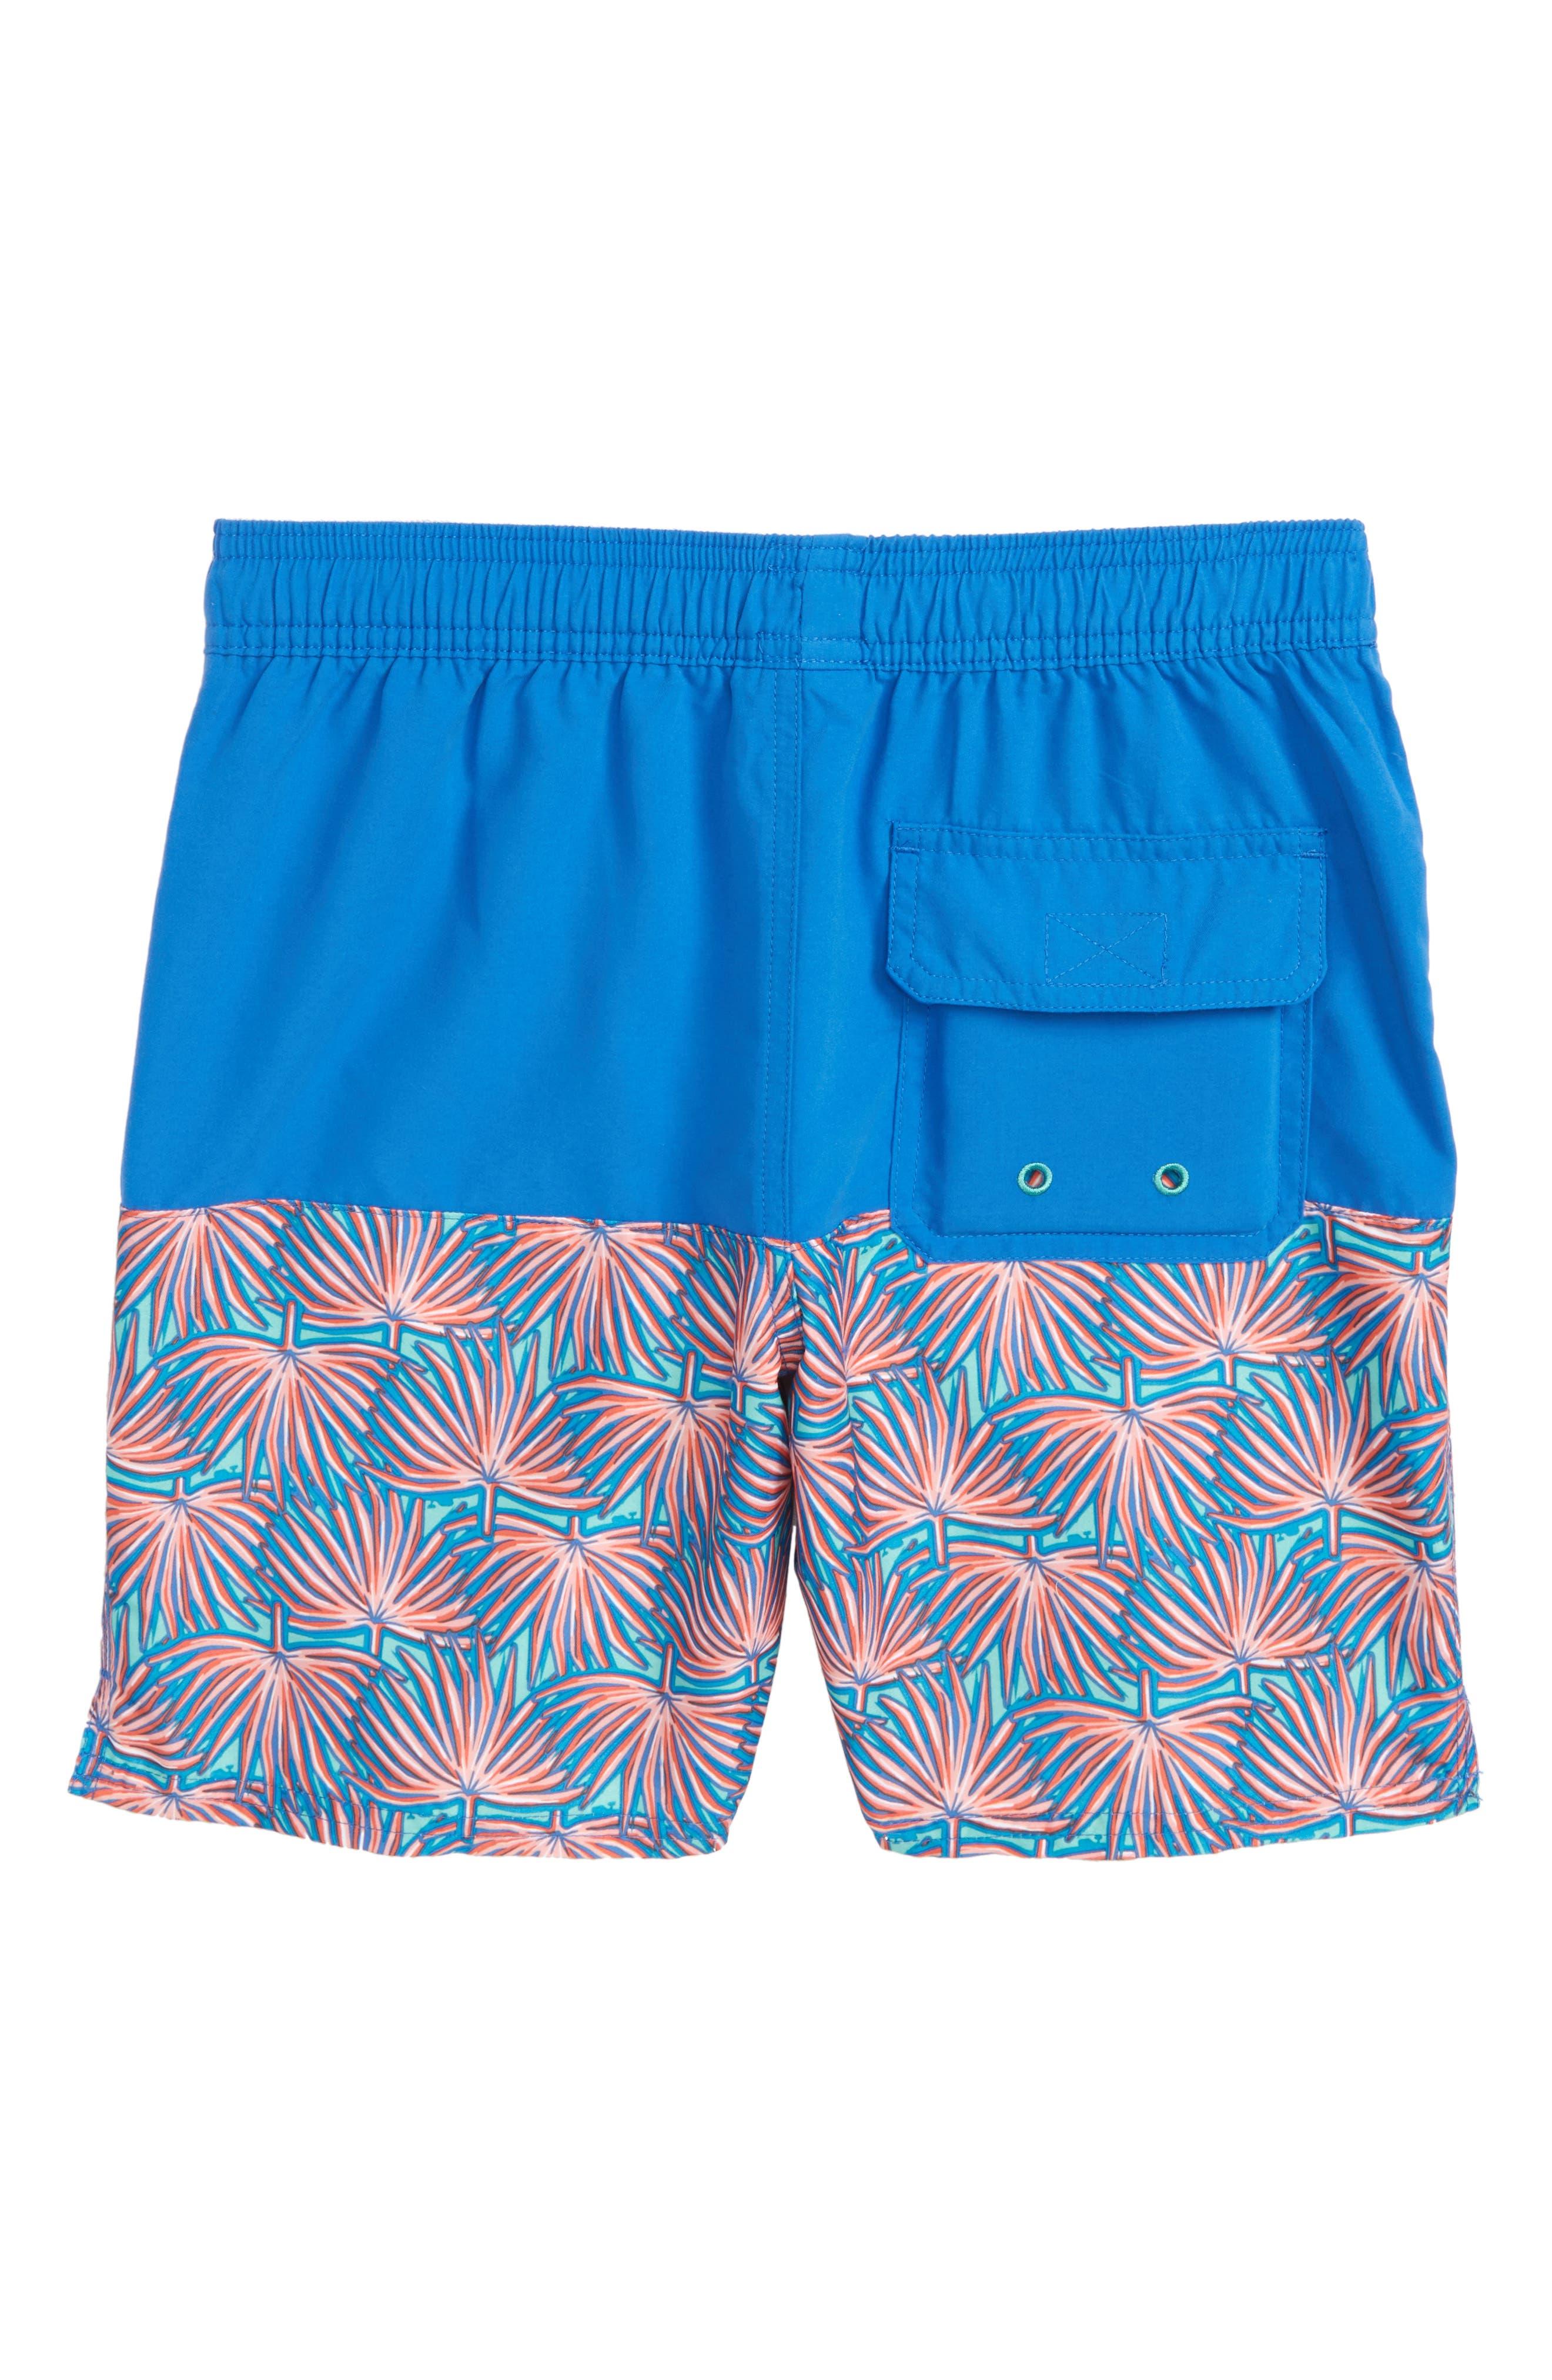 Chappy Fan Palm Print Swim Trunks,                             Alternate thumbnail 2, color,                             Capri Blue